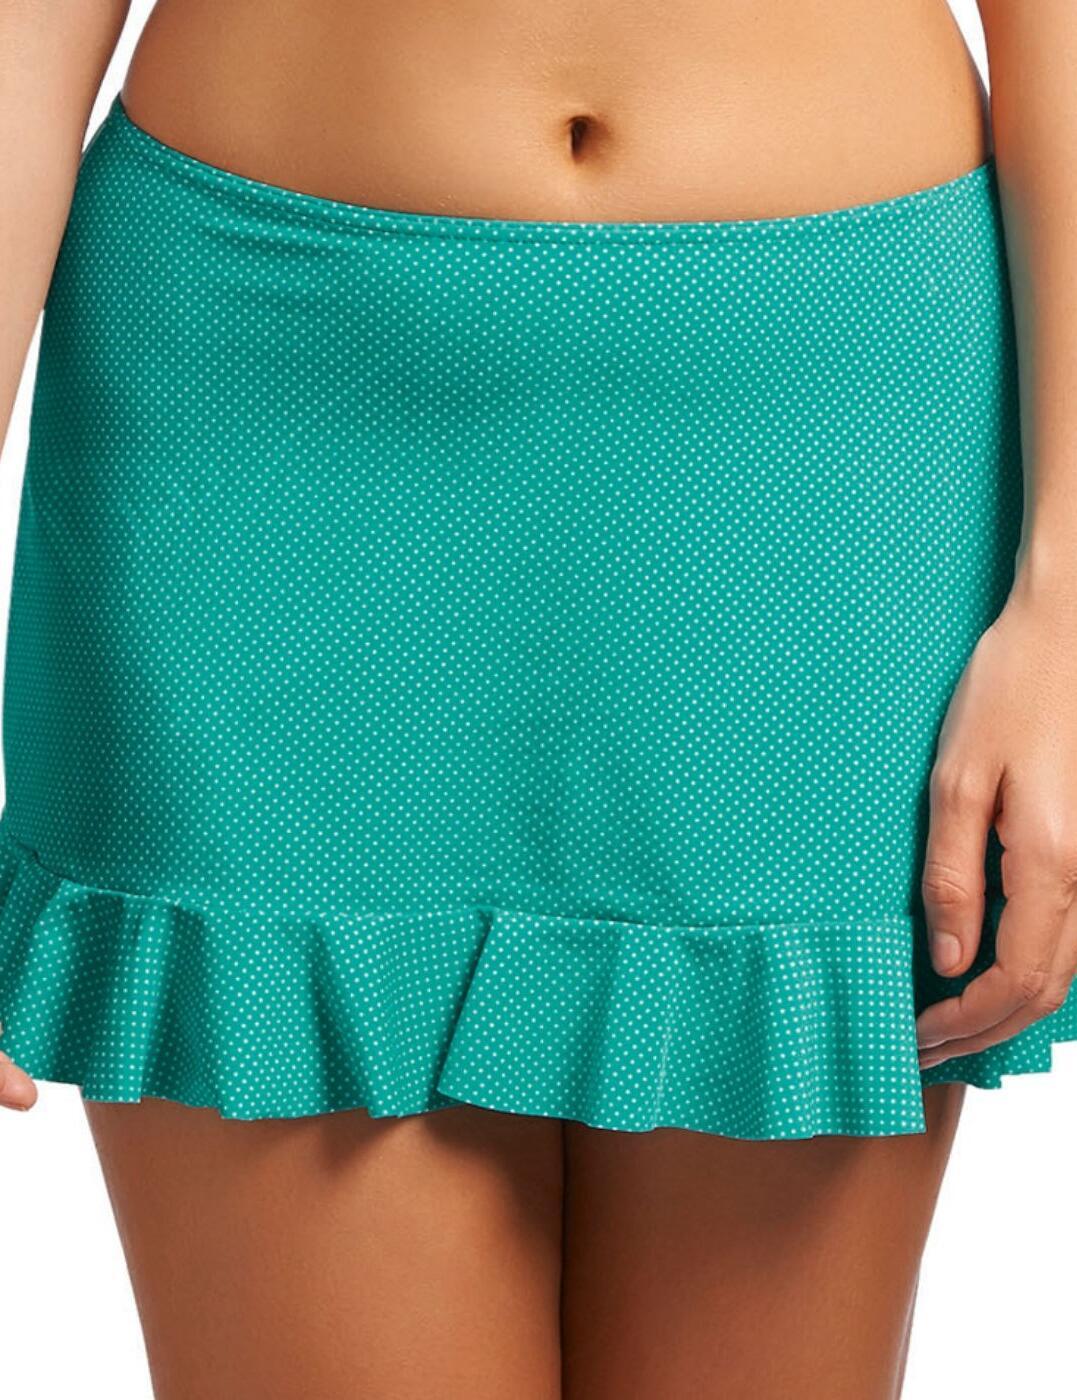 3367 Freya Cherish Bikini Skirt Jade Green - 3367 Jade Green